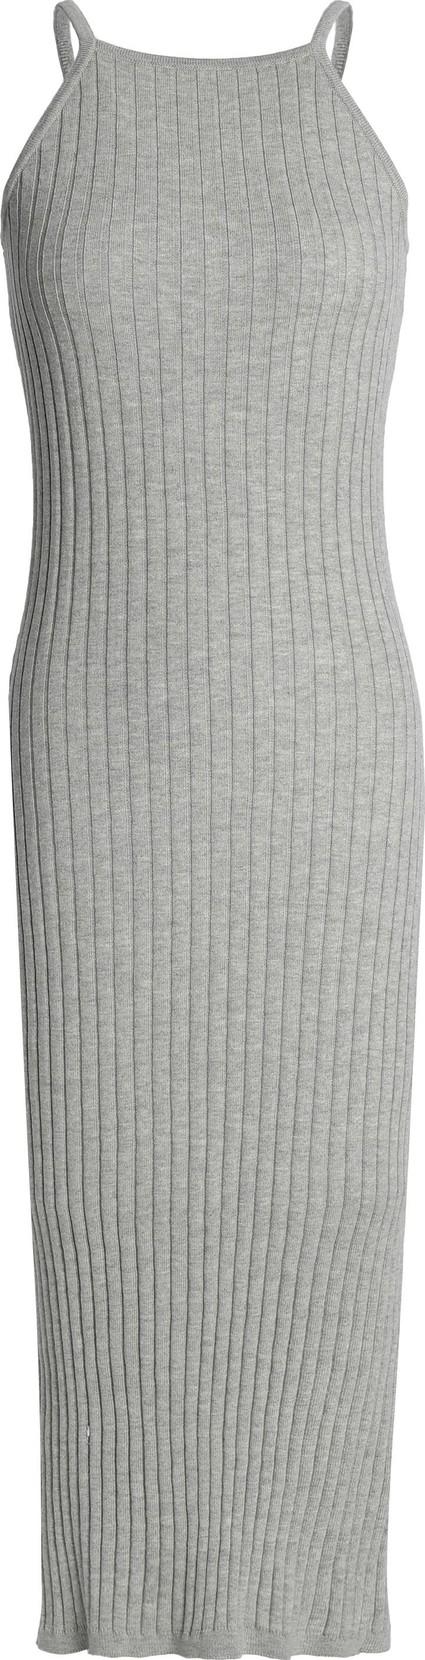 Autumn Cashmere Ribbed cotton midi dress